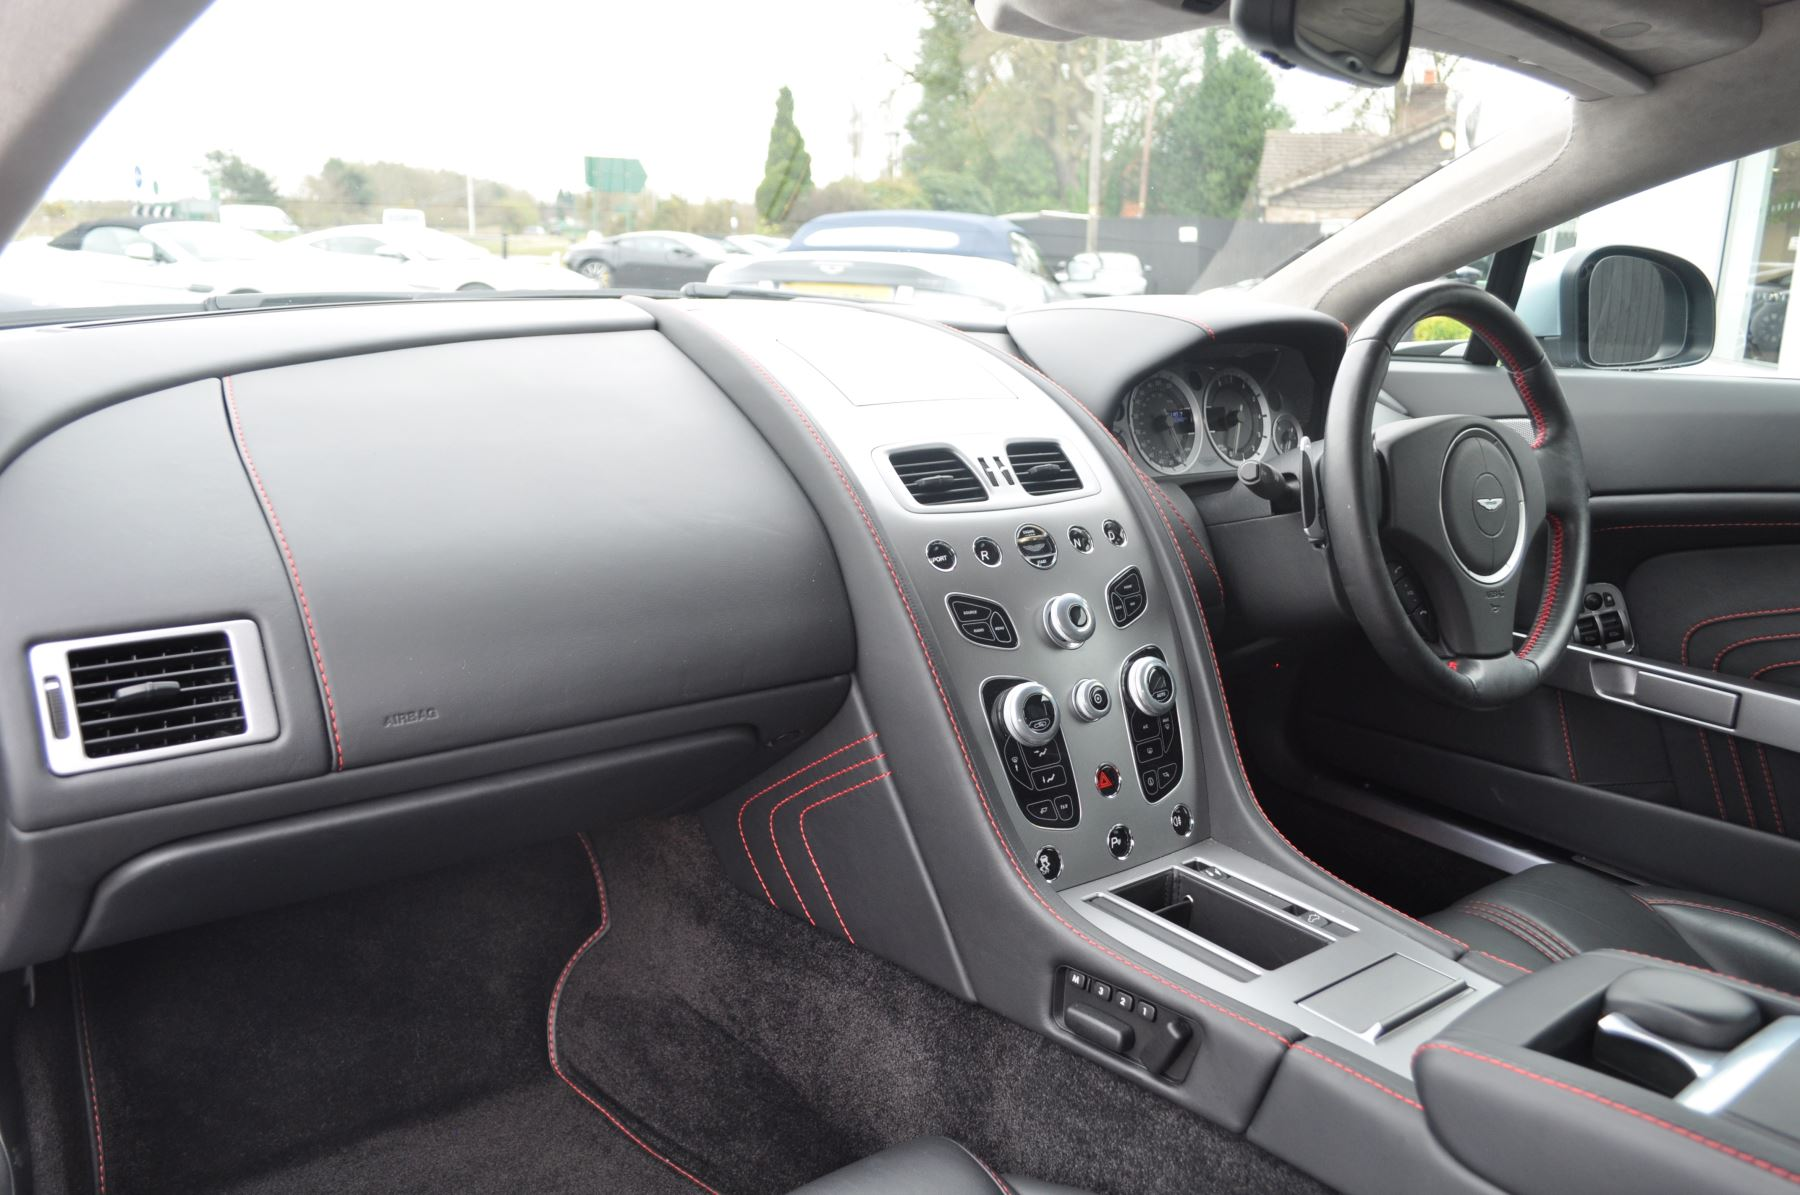 Aston Martin V8 Vantage S Coupe Coupe image 24